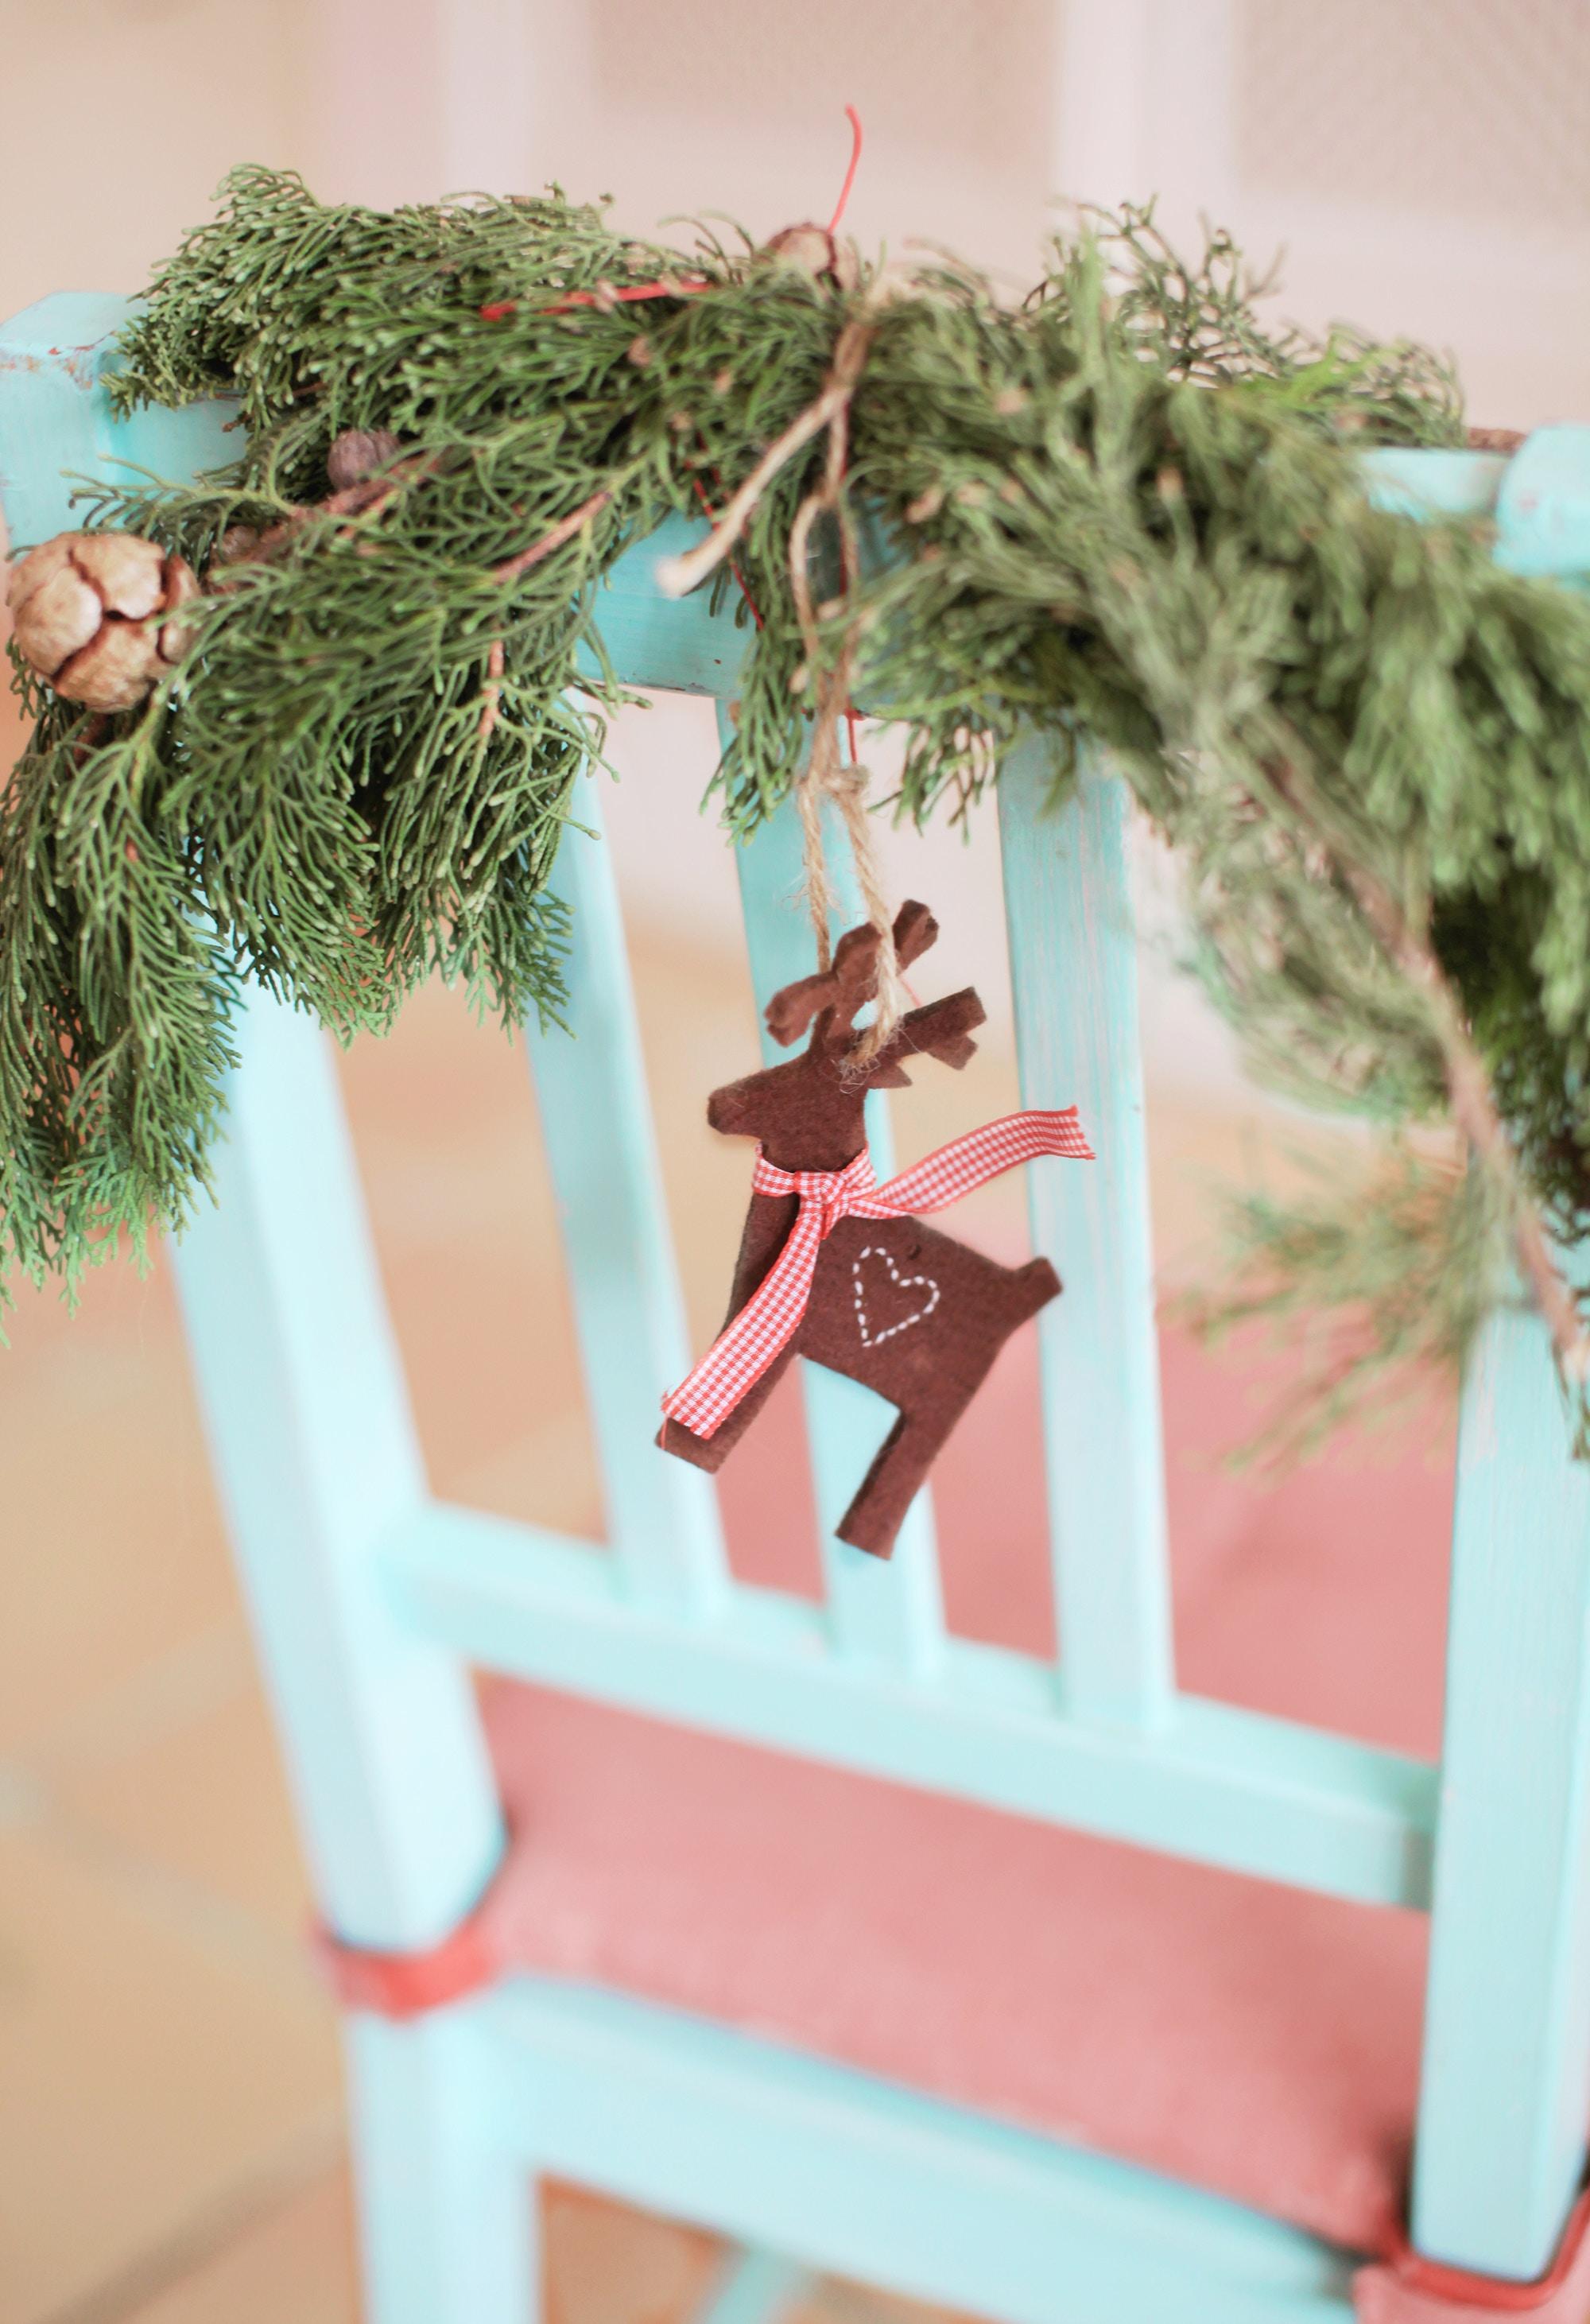 elena-ferrer-167494-unsplash holiday reindeer.jpg